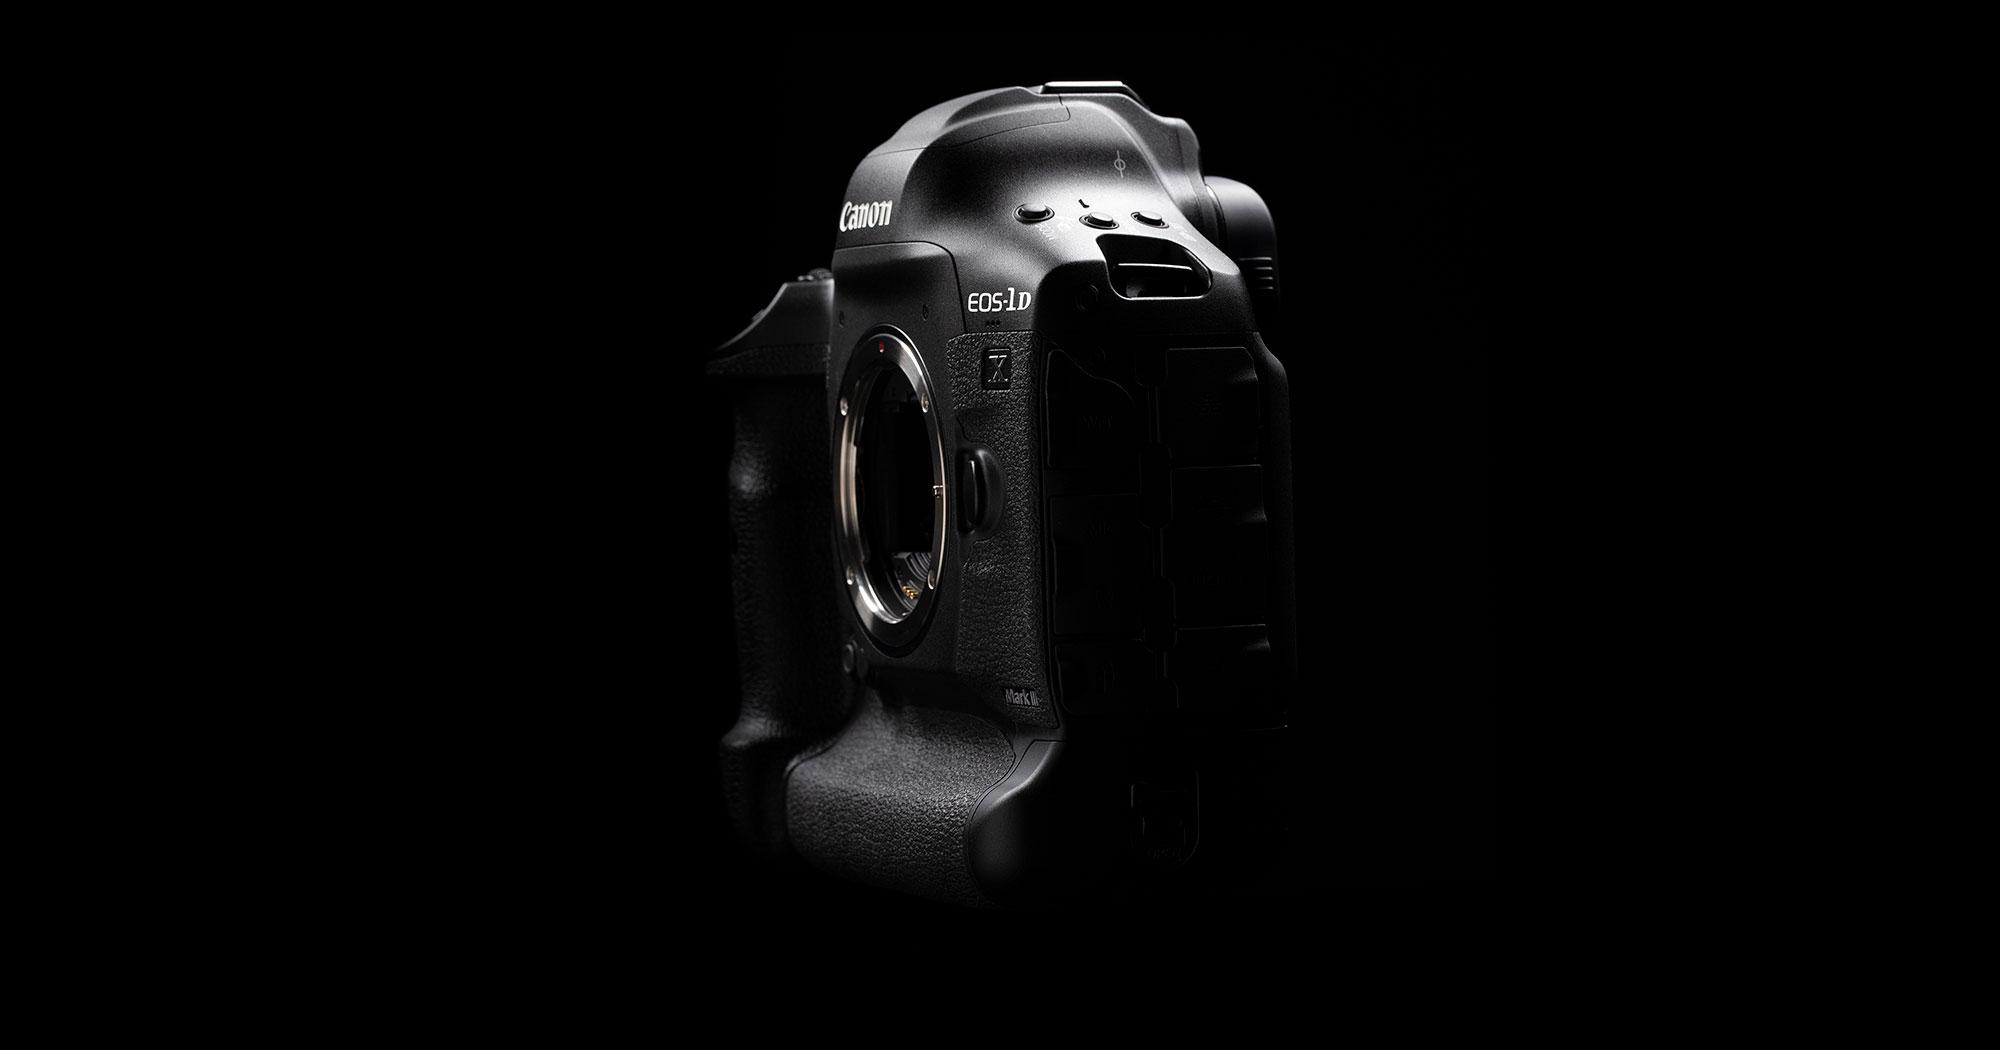 Canon 1DX III announced